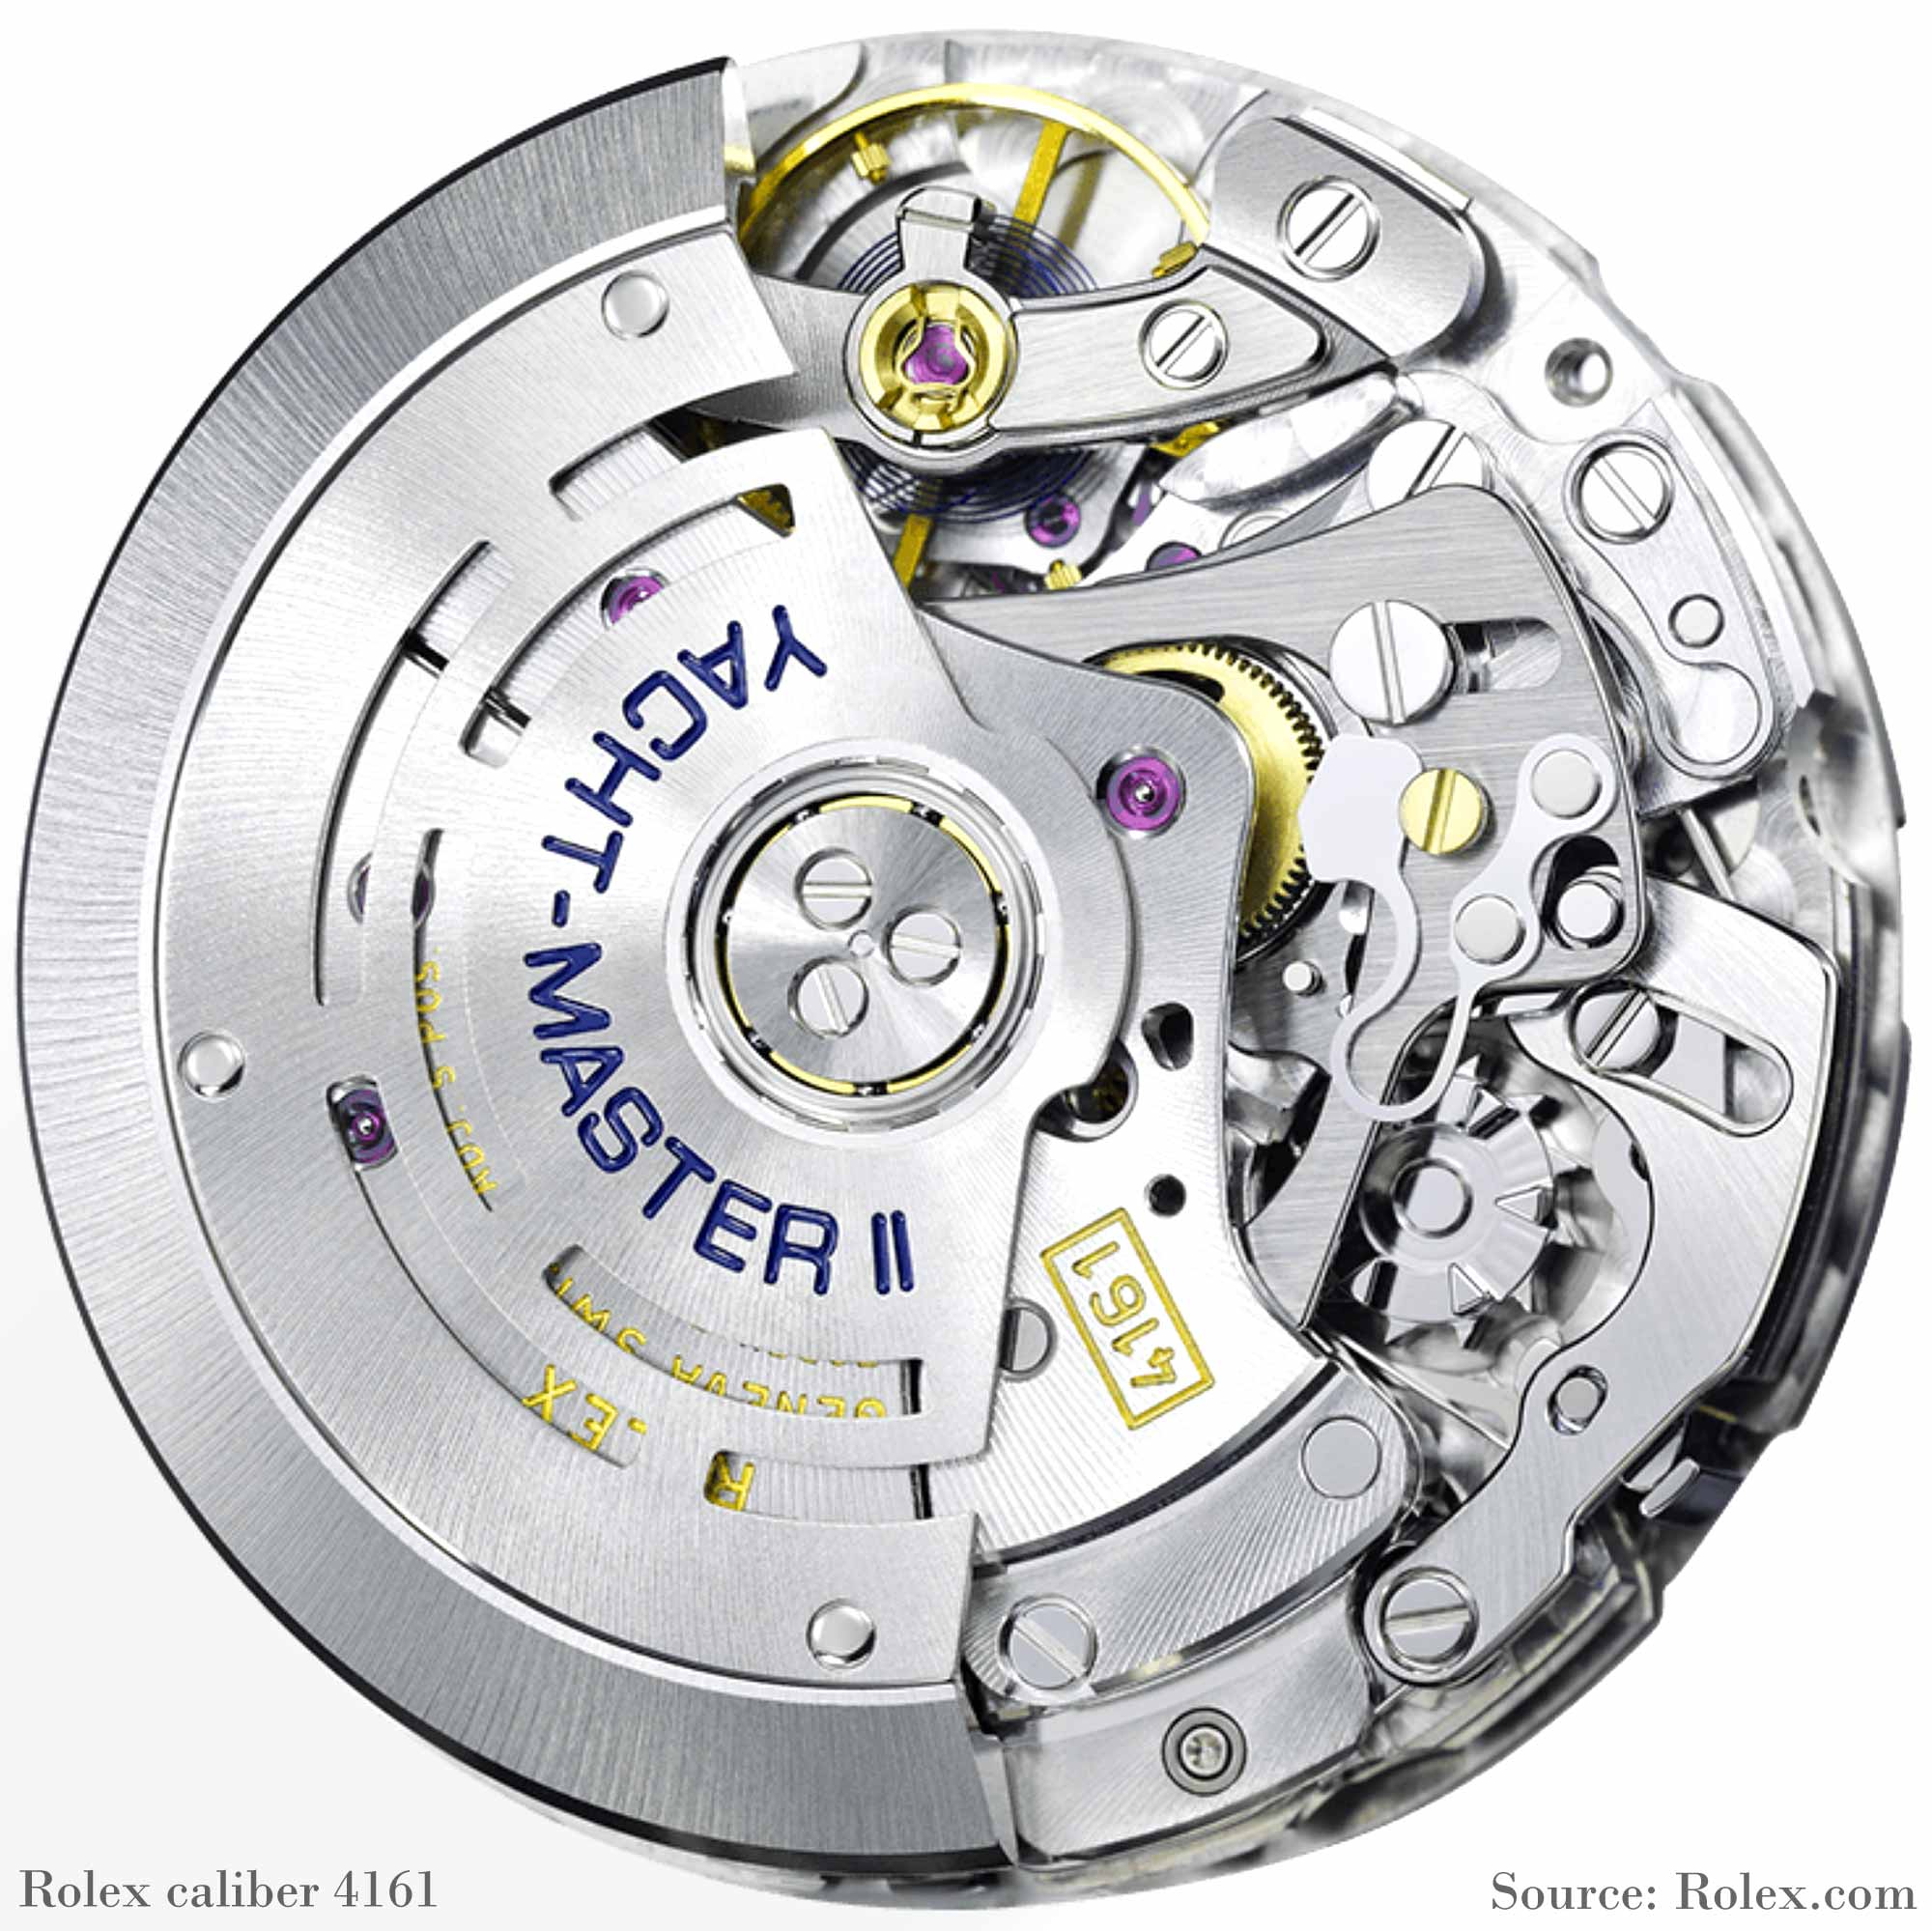 Watch Movement - Automatic - Rolex 4161